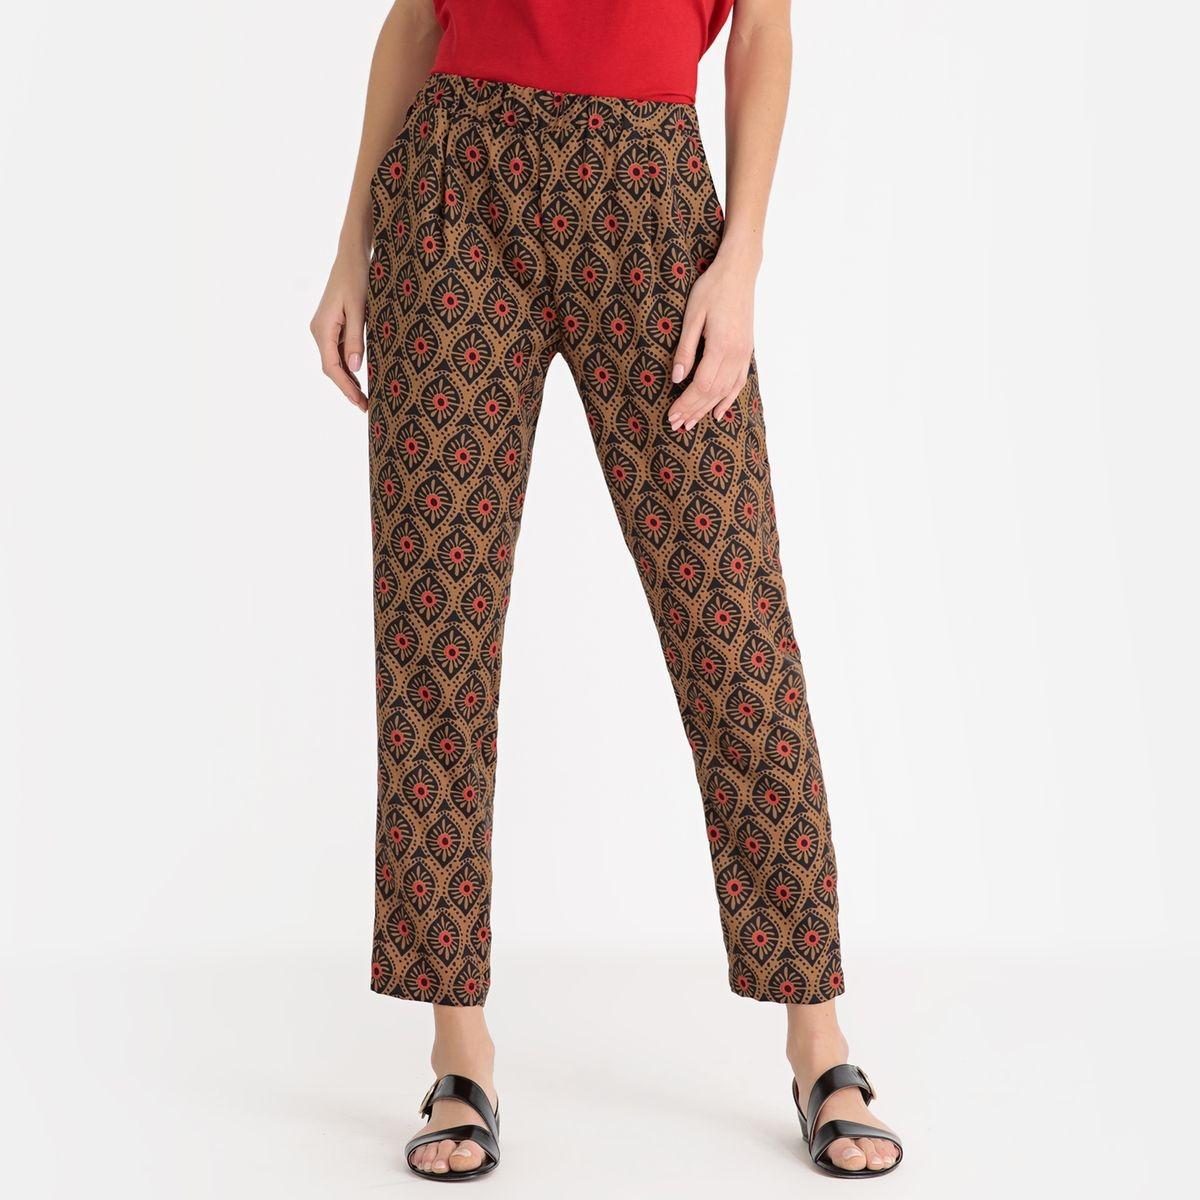 Pantalon tissu imprimé YOAN